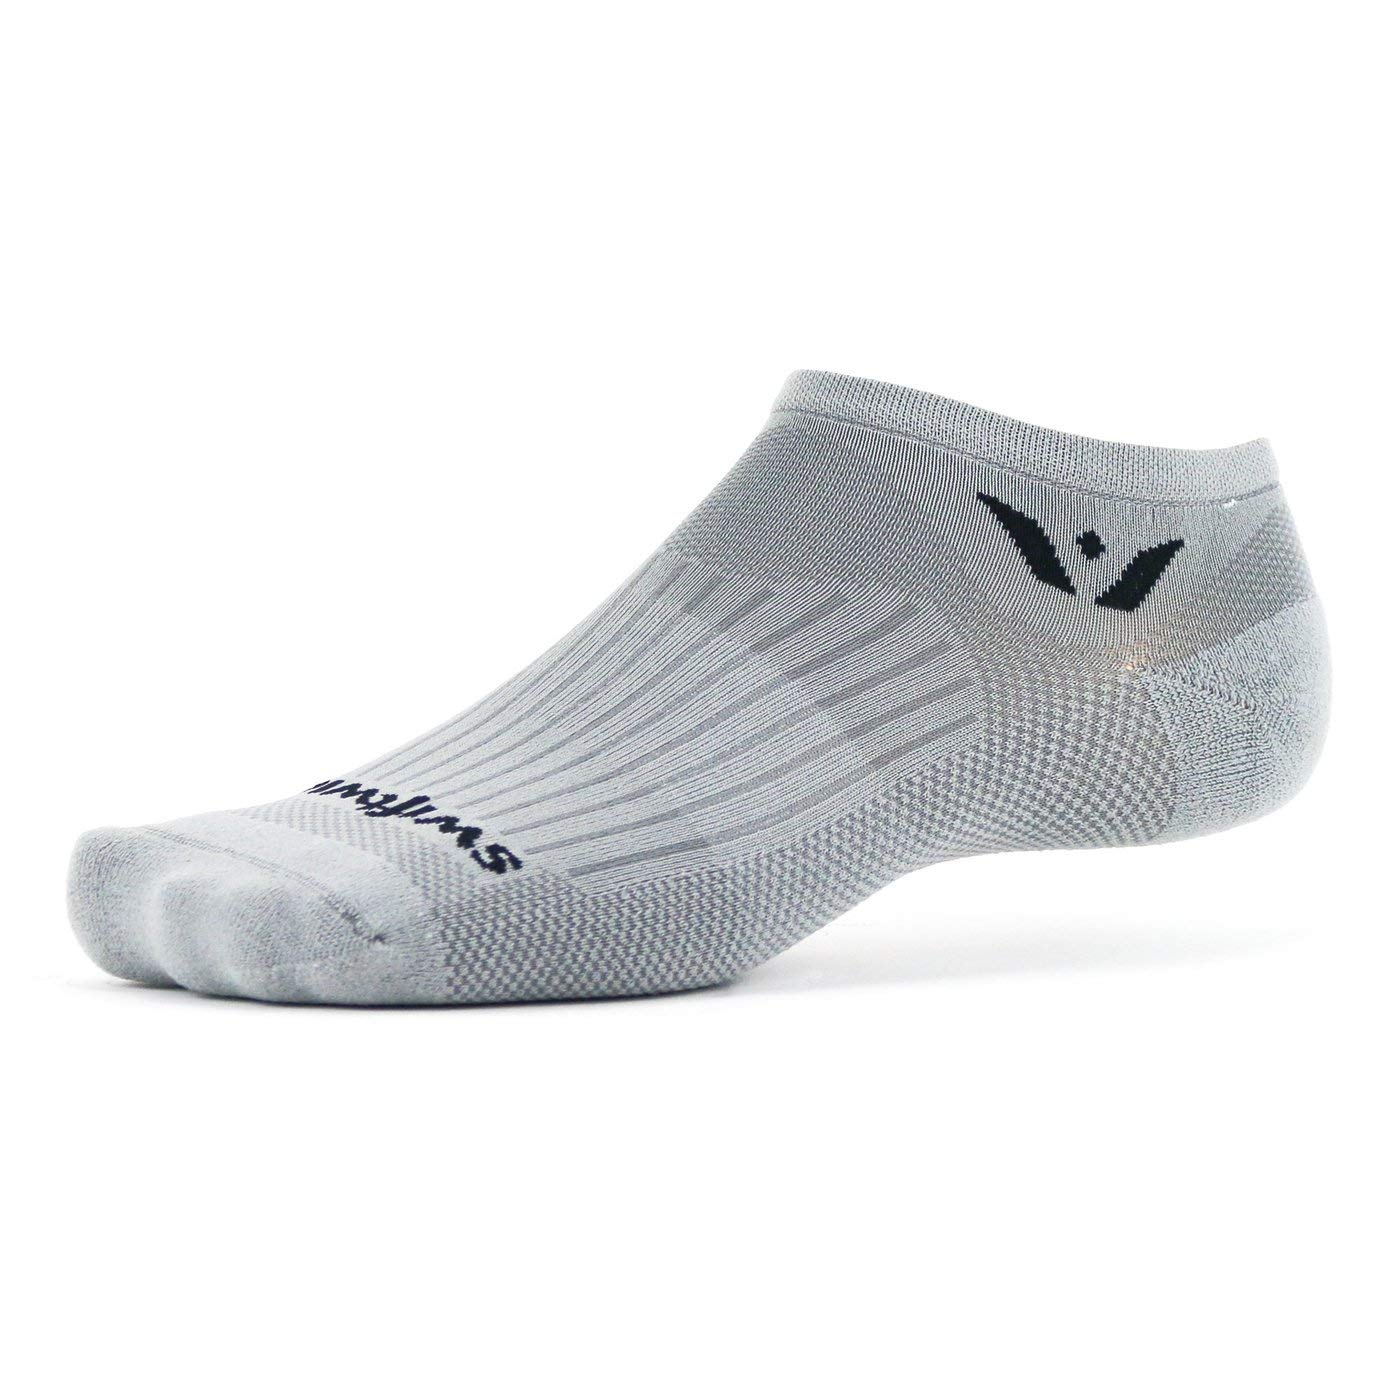 Swiftwick- ASPIRE ZERO   Socks Built for Running